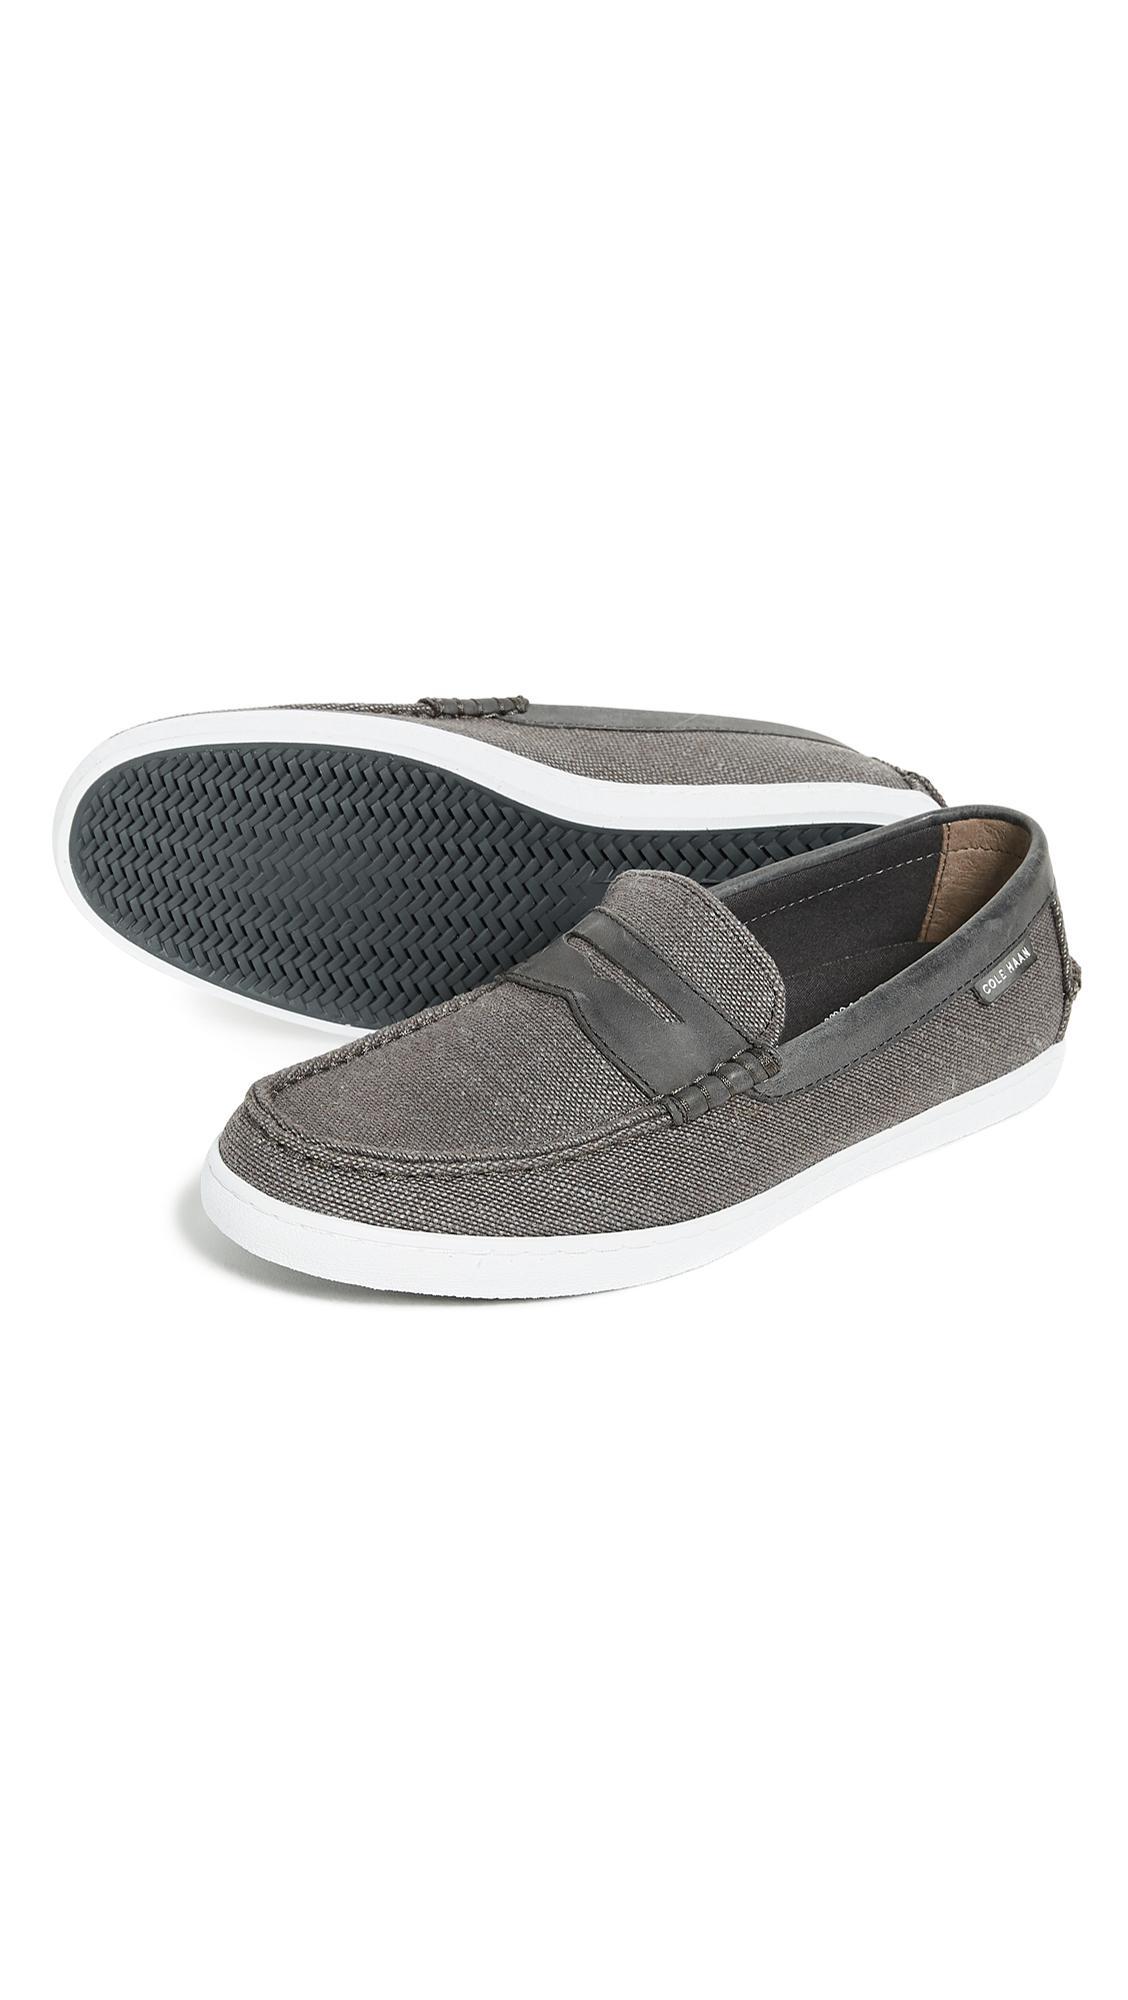 Cole Haan Canvas Pinch Weekender Slip-on Loafer in Grey for Men